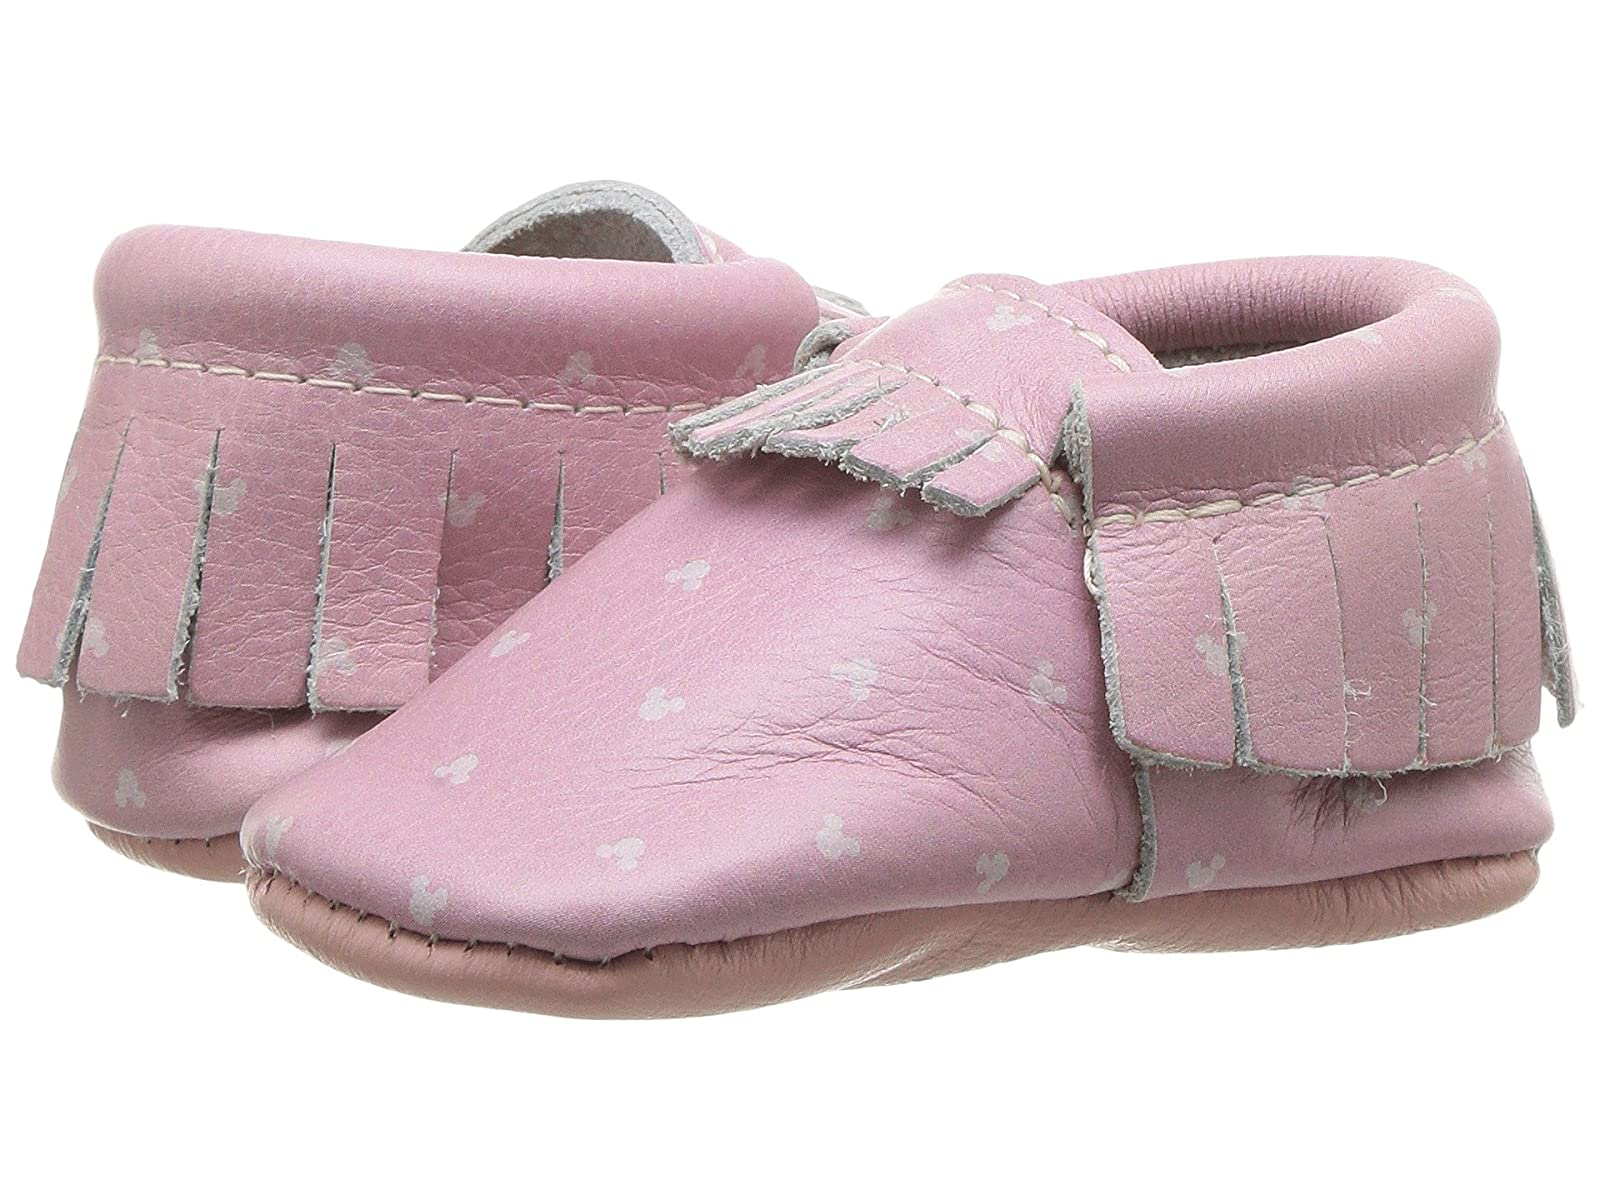 Freshly Picked Soft Sole Disney Moccasins (Infant/Toddler)Atmospheric grades have affordable shoes